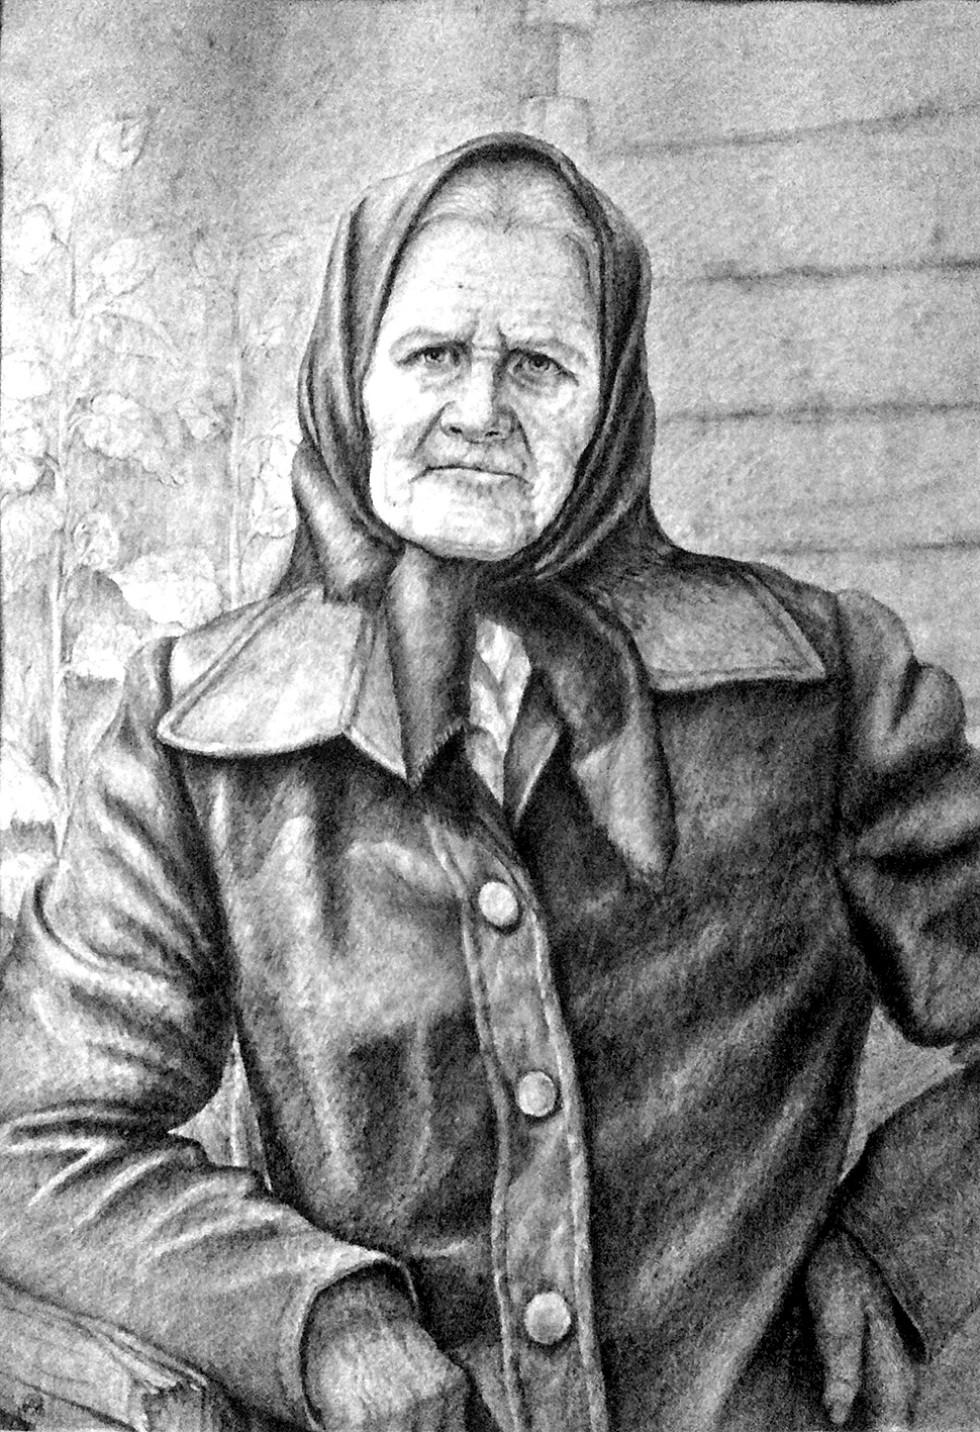 Портрет бабусі Маріанни Ілюшик